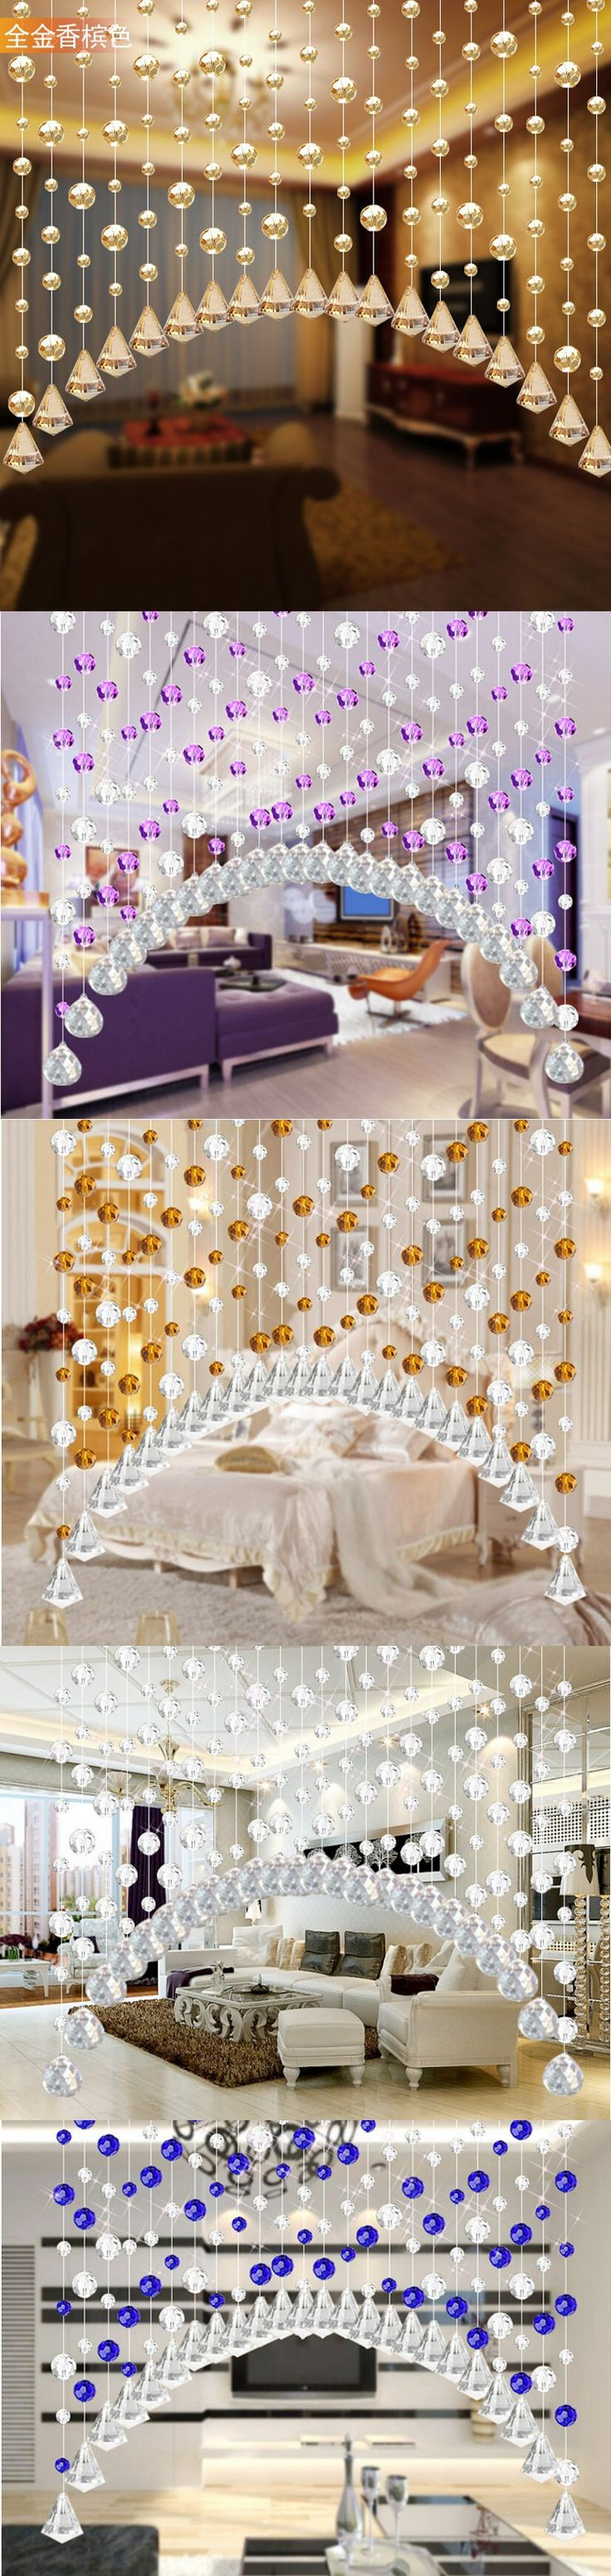 Novelty Crystal Bead Curtain Kitchen Door Curtains Luxury Crystal Curtains For Living Room Crystal Bead Curtain $33